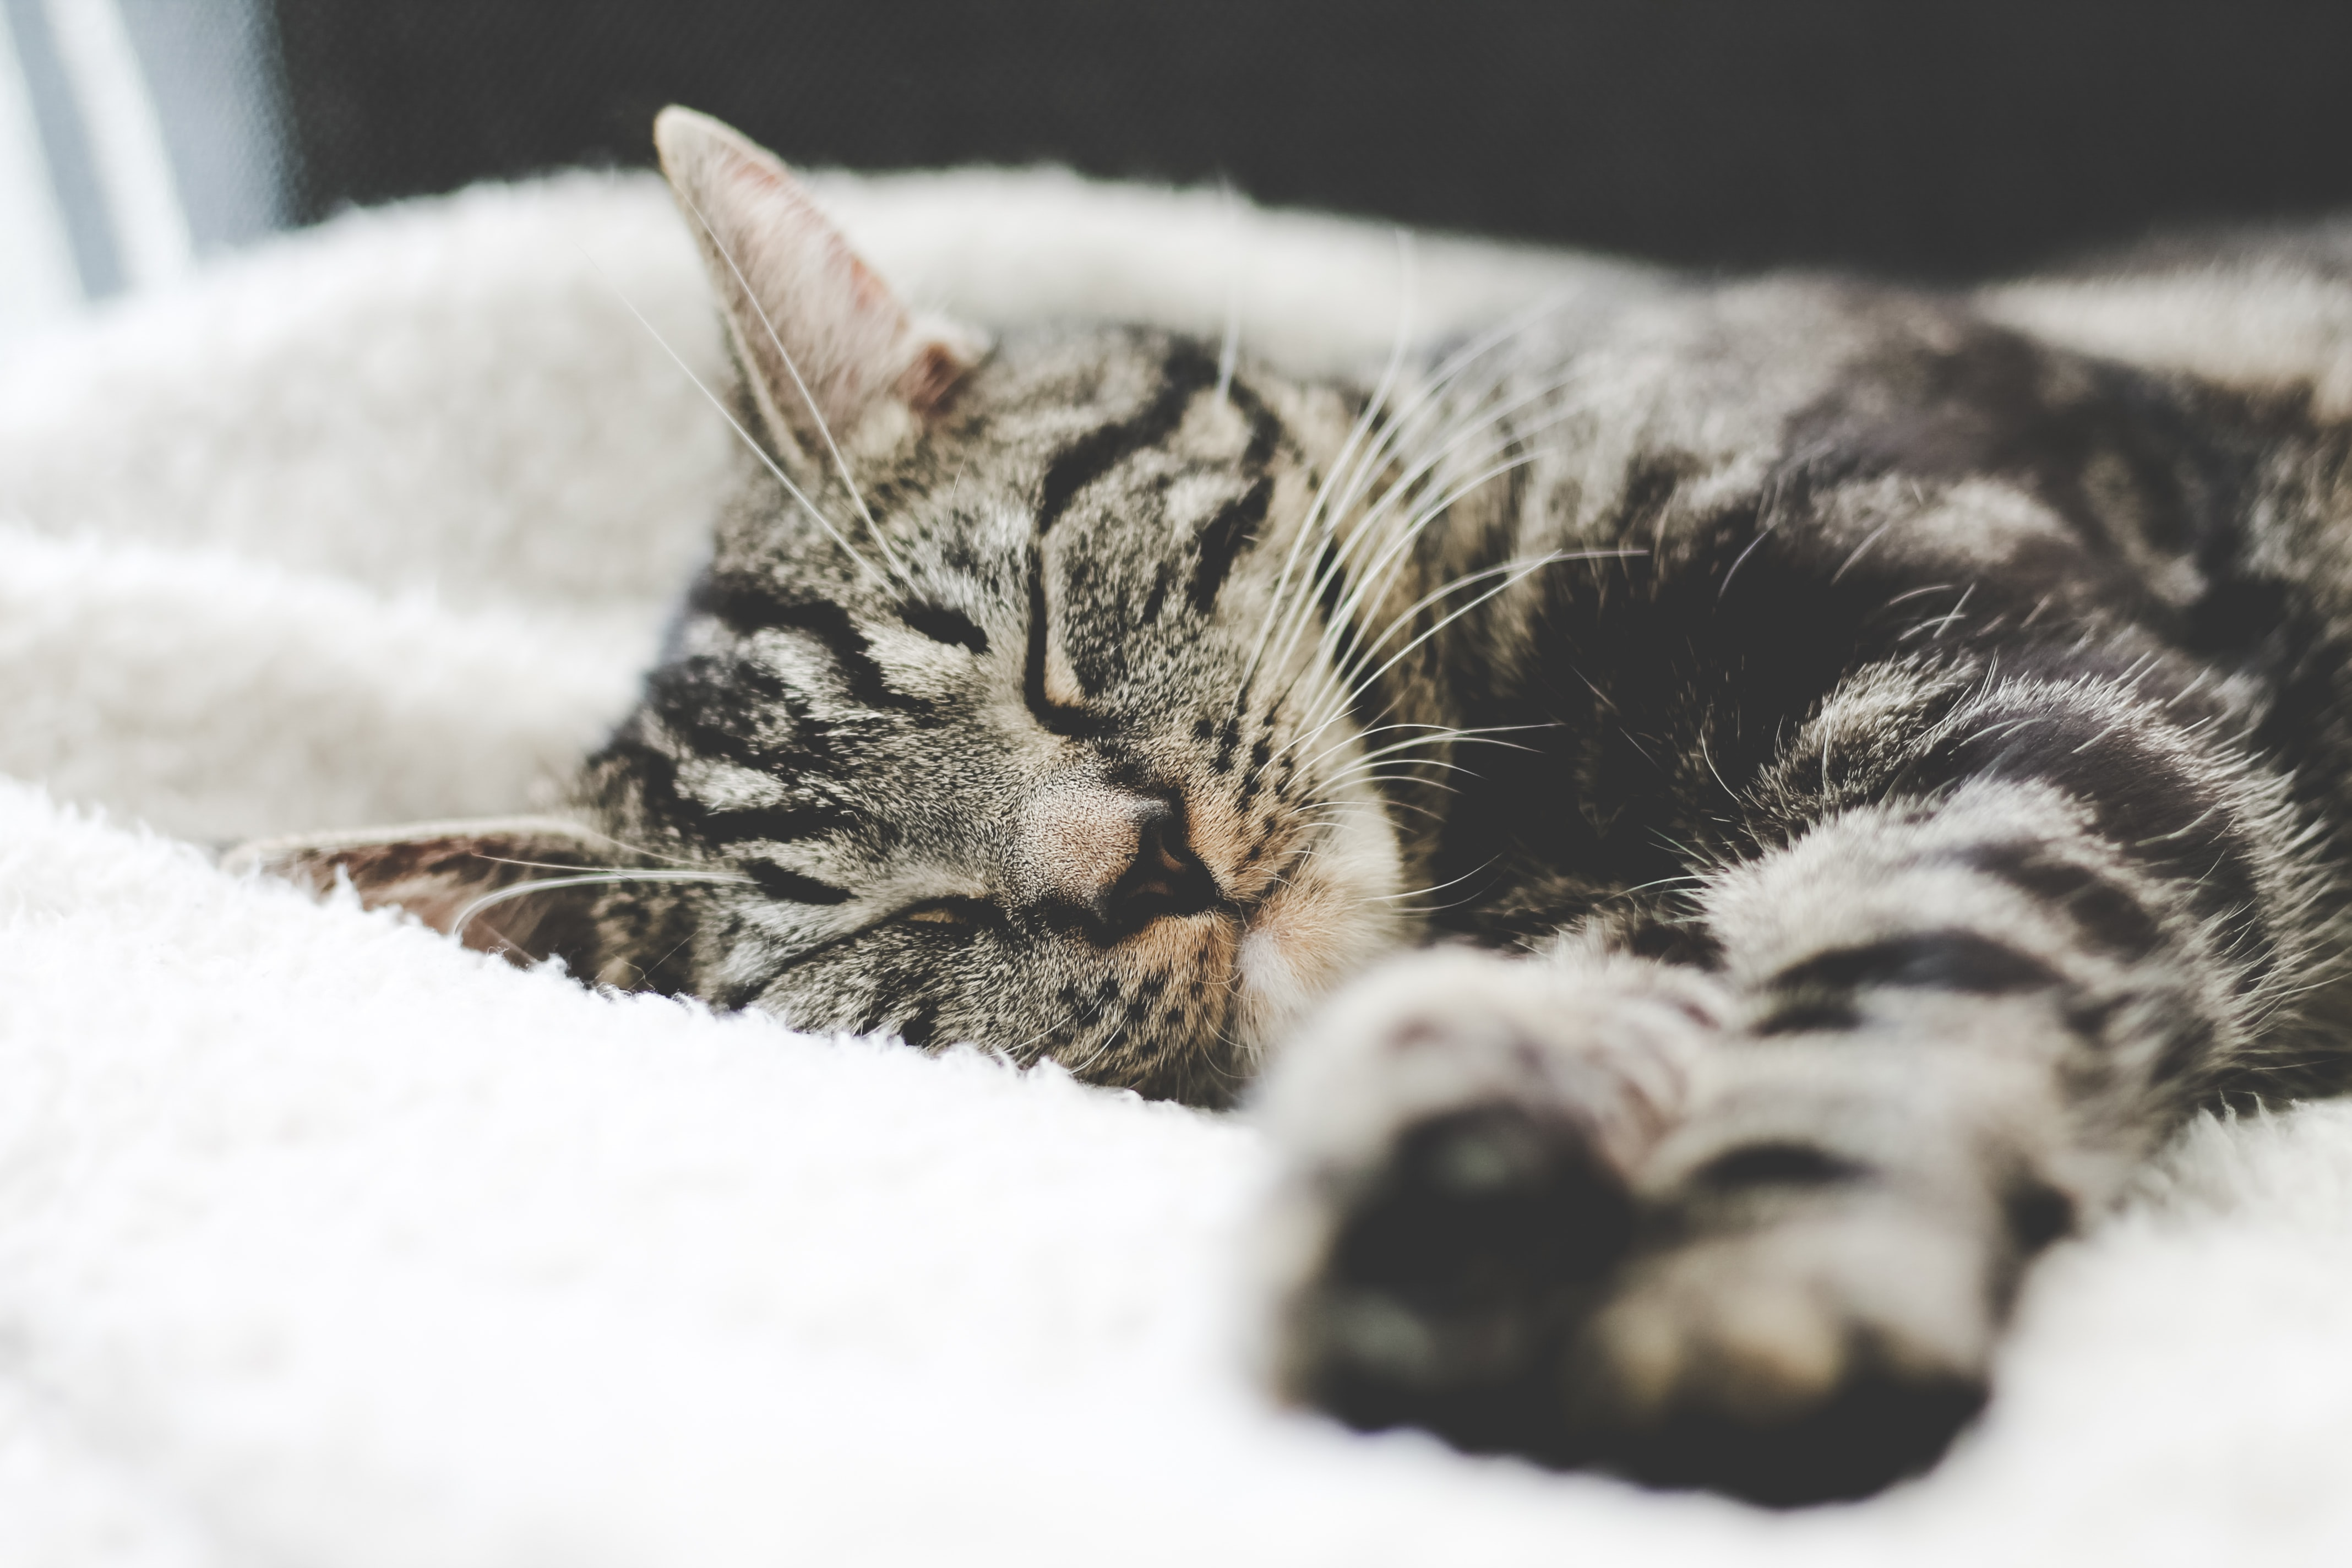 silver tabby cat sleeping on white blanket